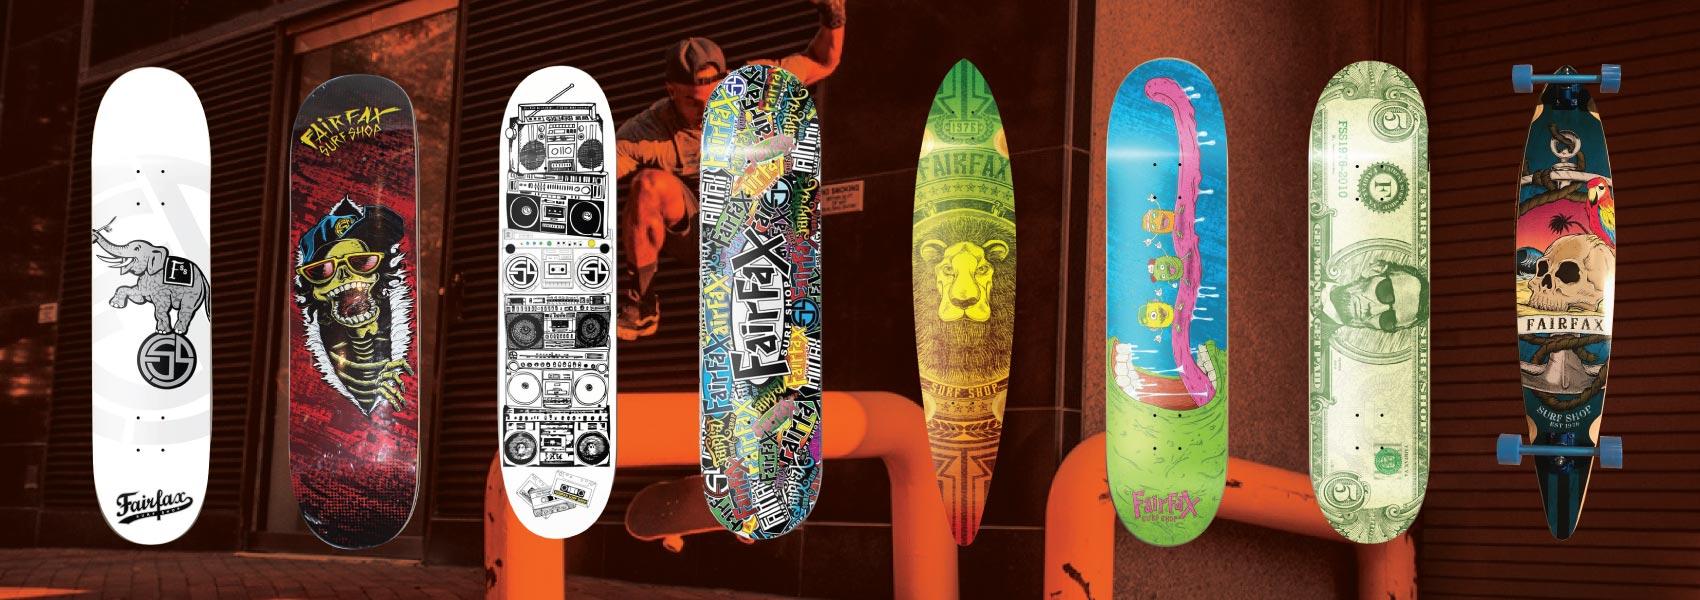 Fairfax Surf Shop Skateboards